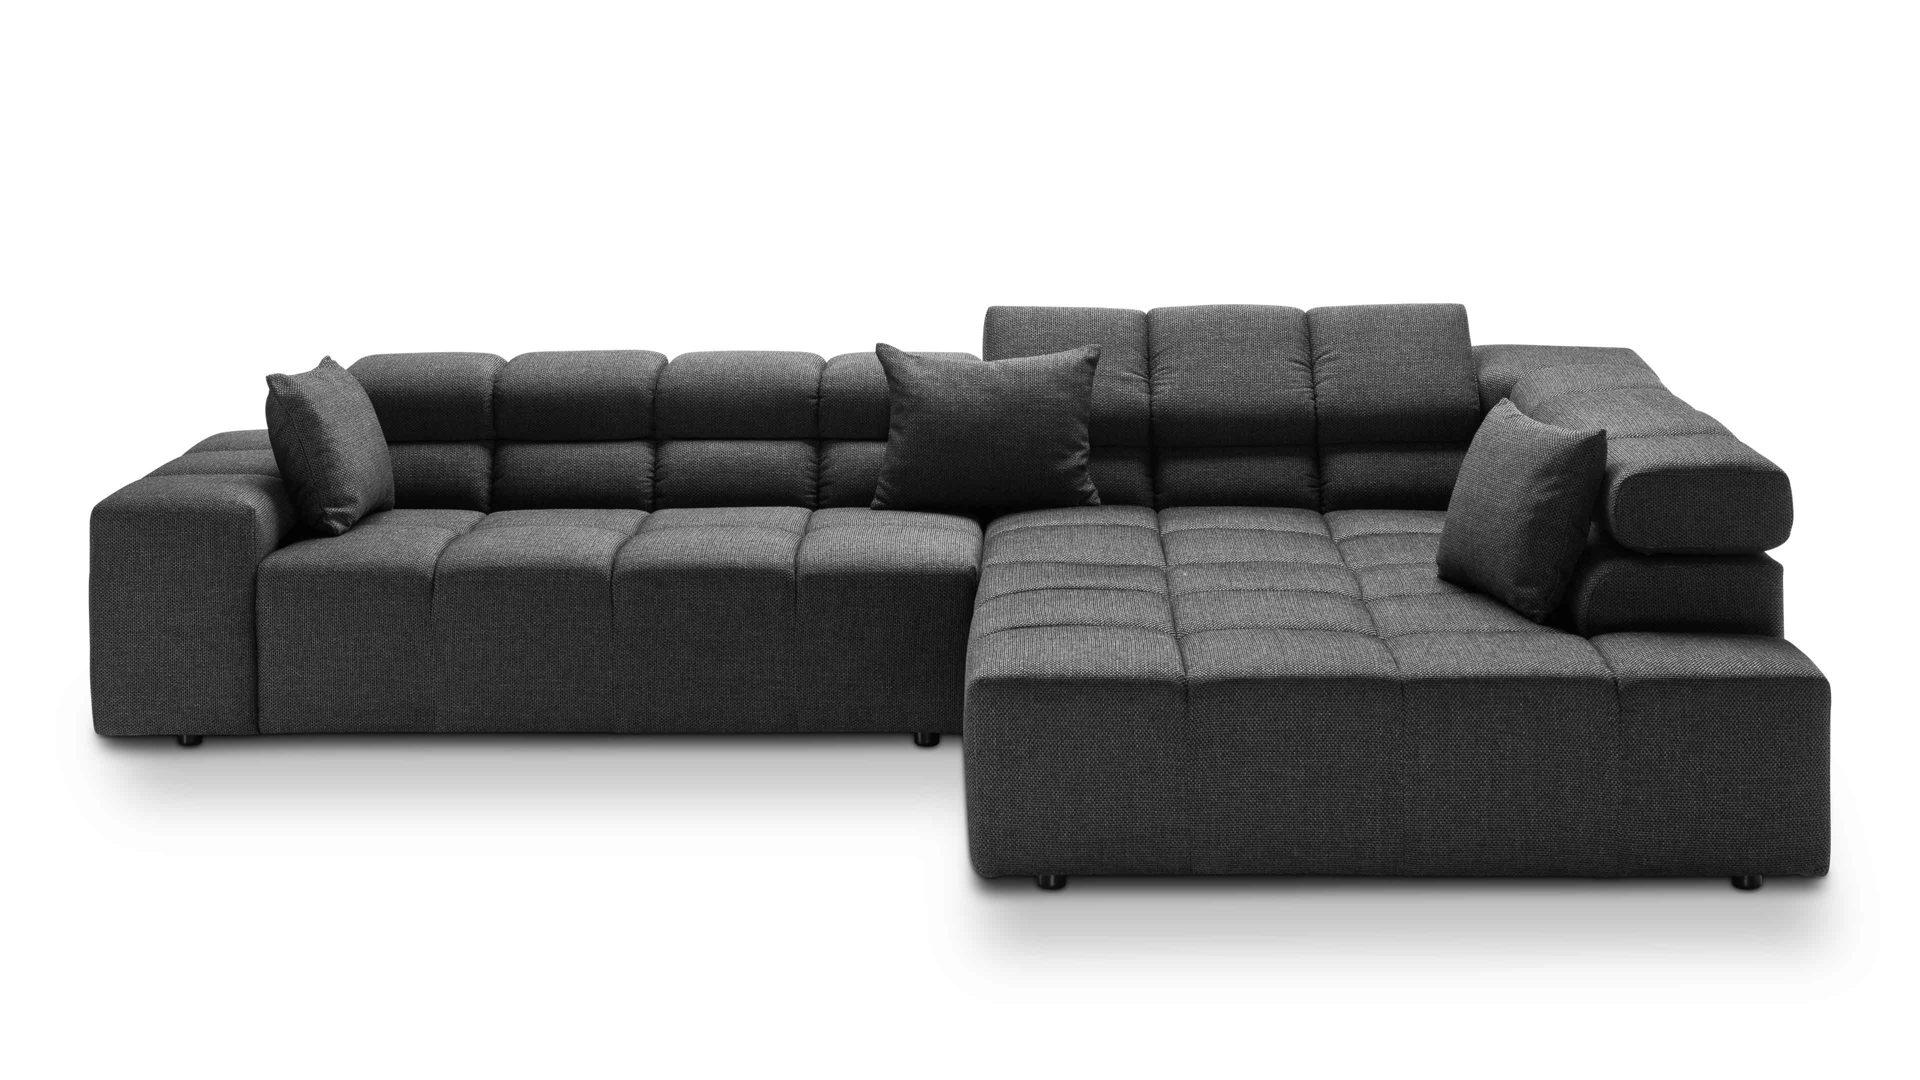 Lounge ecksofa  Einrichtungspartner Ring | Markenshops | Alle Kategorien ...